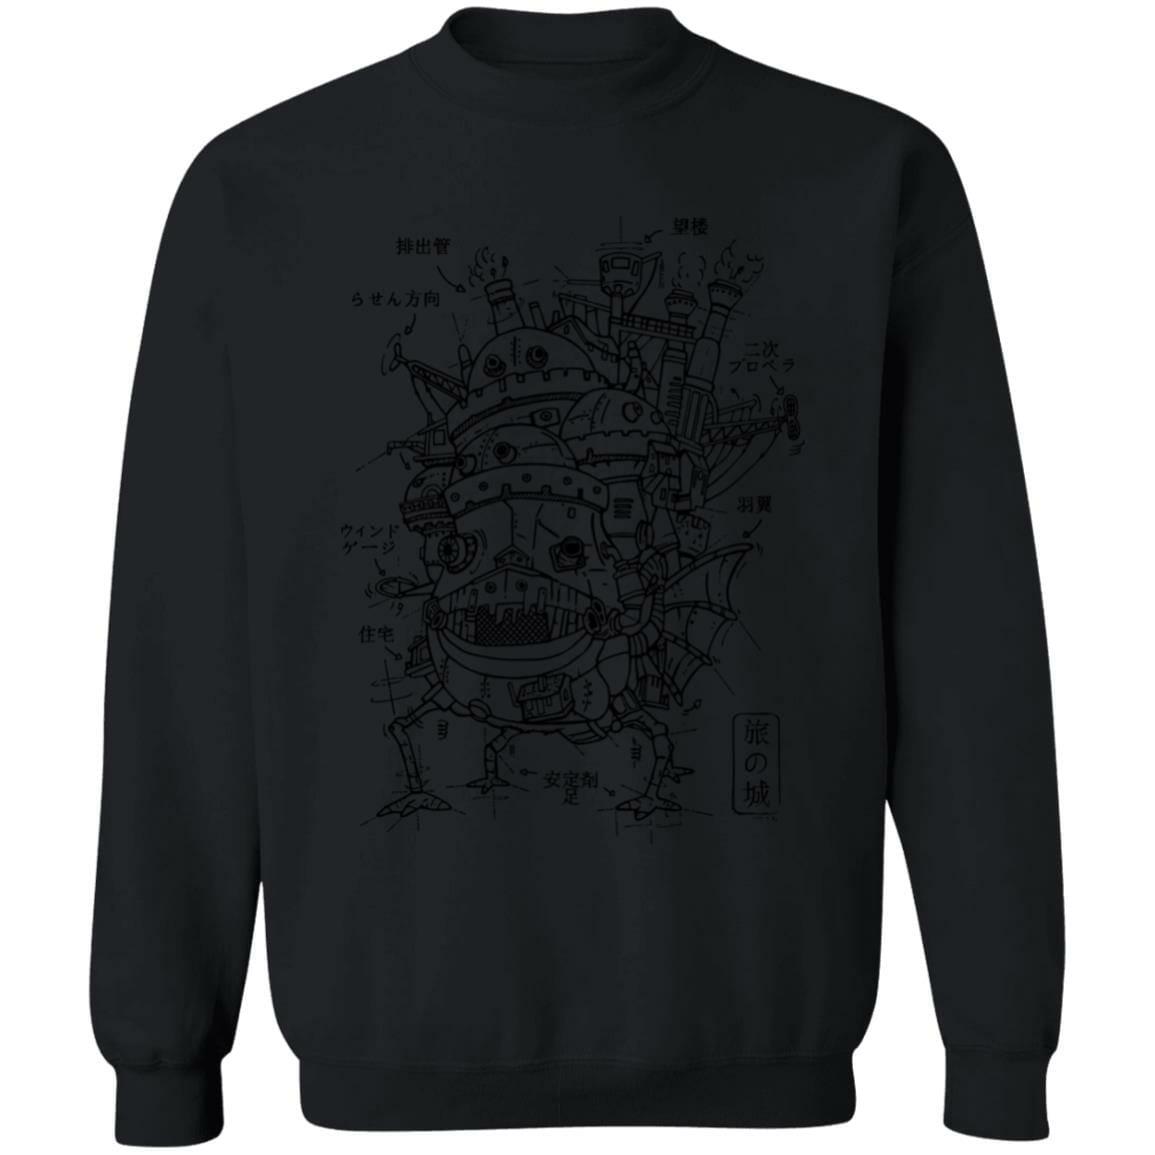 Howl's Moving Castle Sketch Sweatshirt